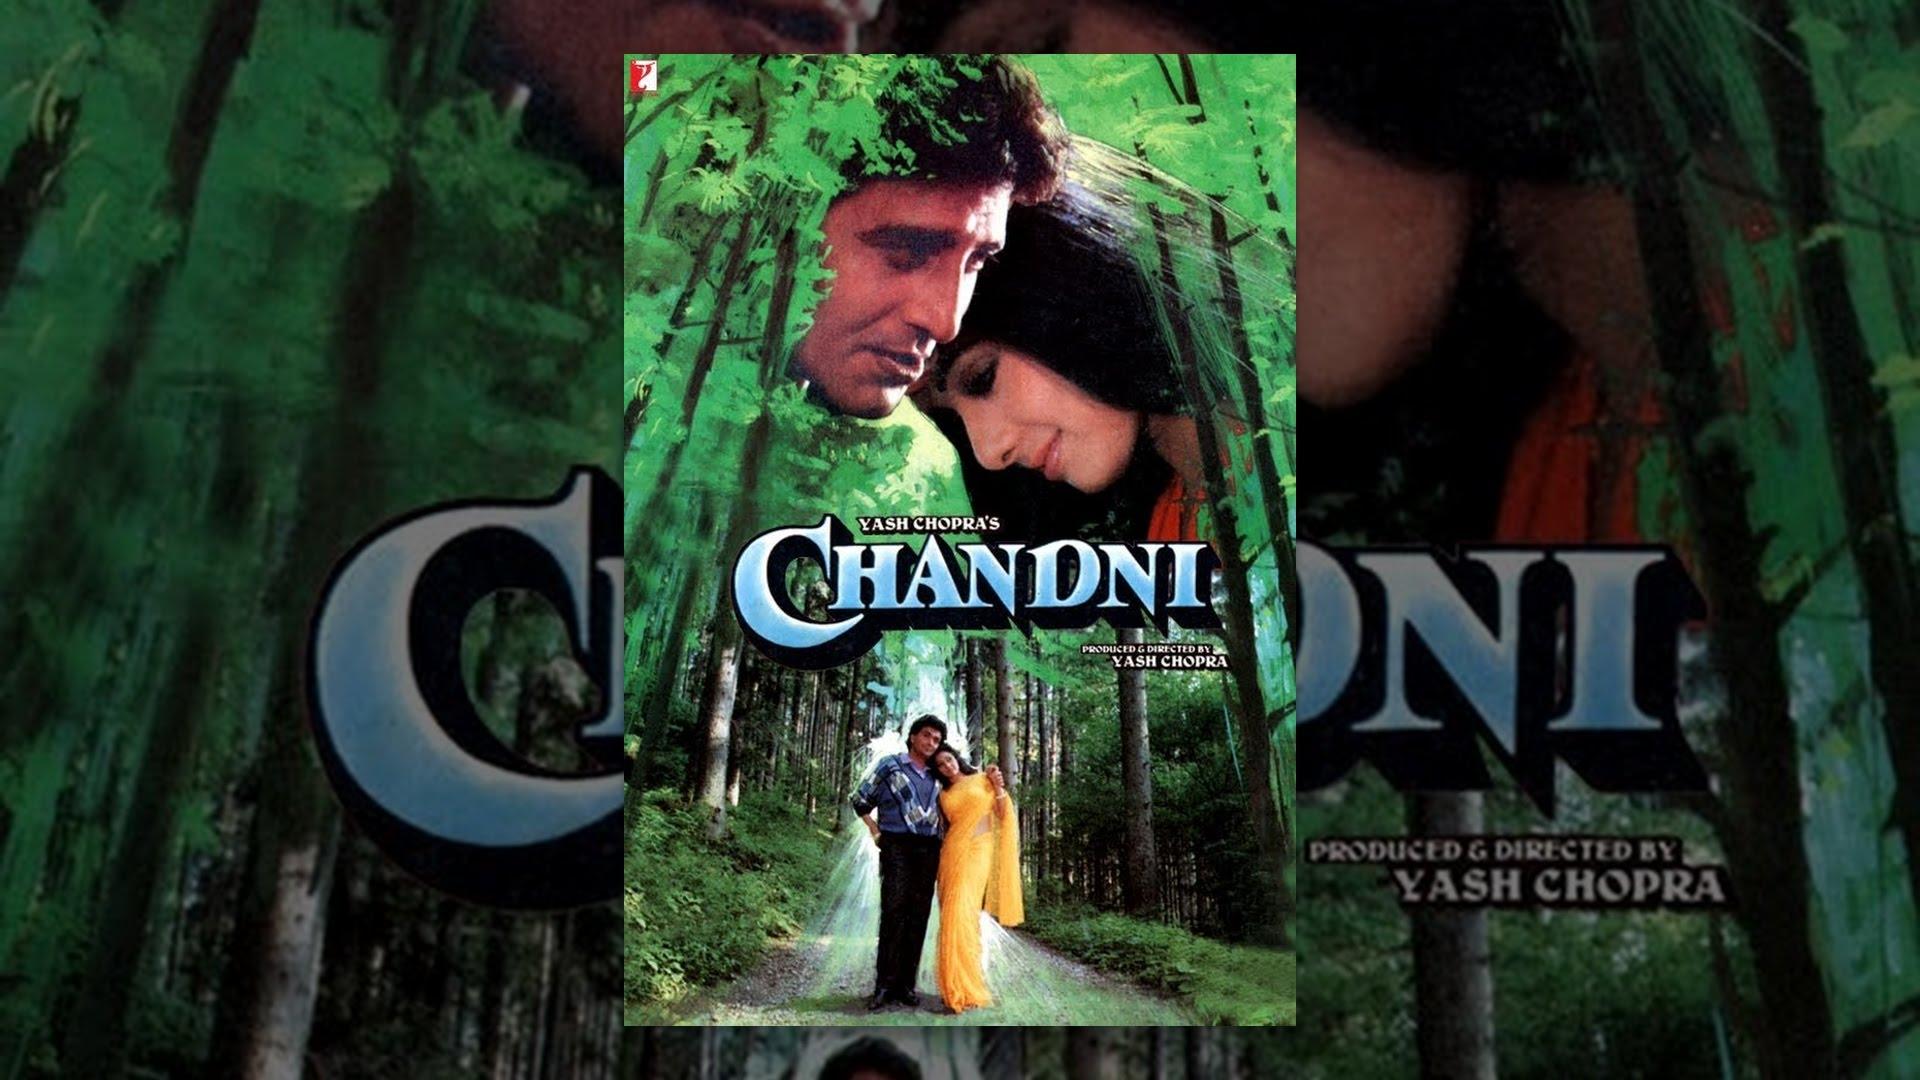 Chandni Movie Chandni - YouTu...